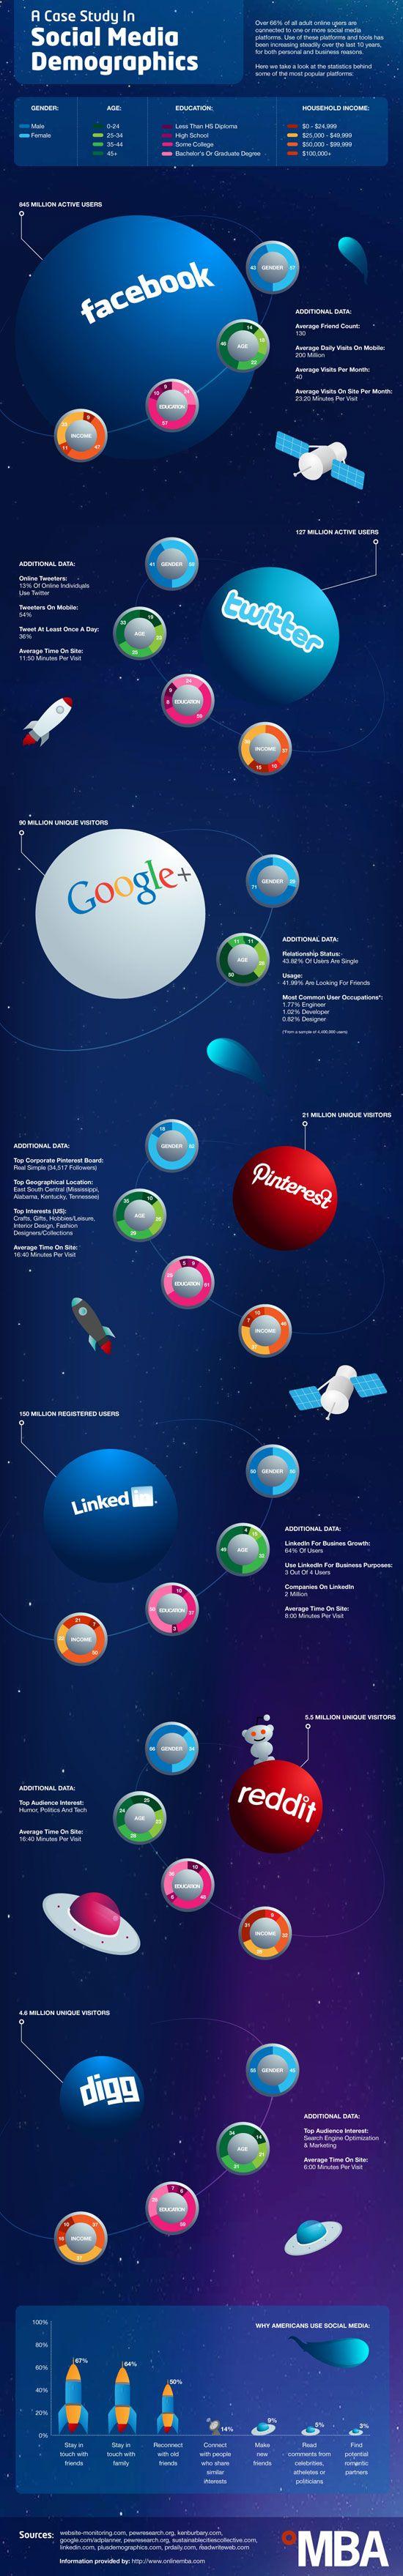 Social Media Demographics #infographic